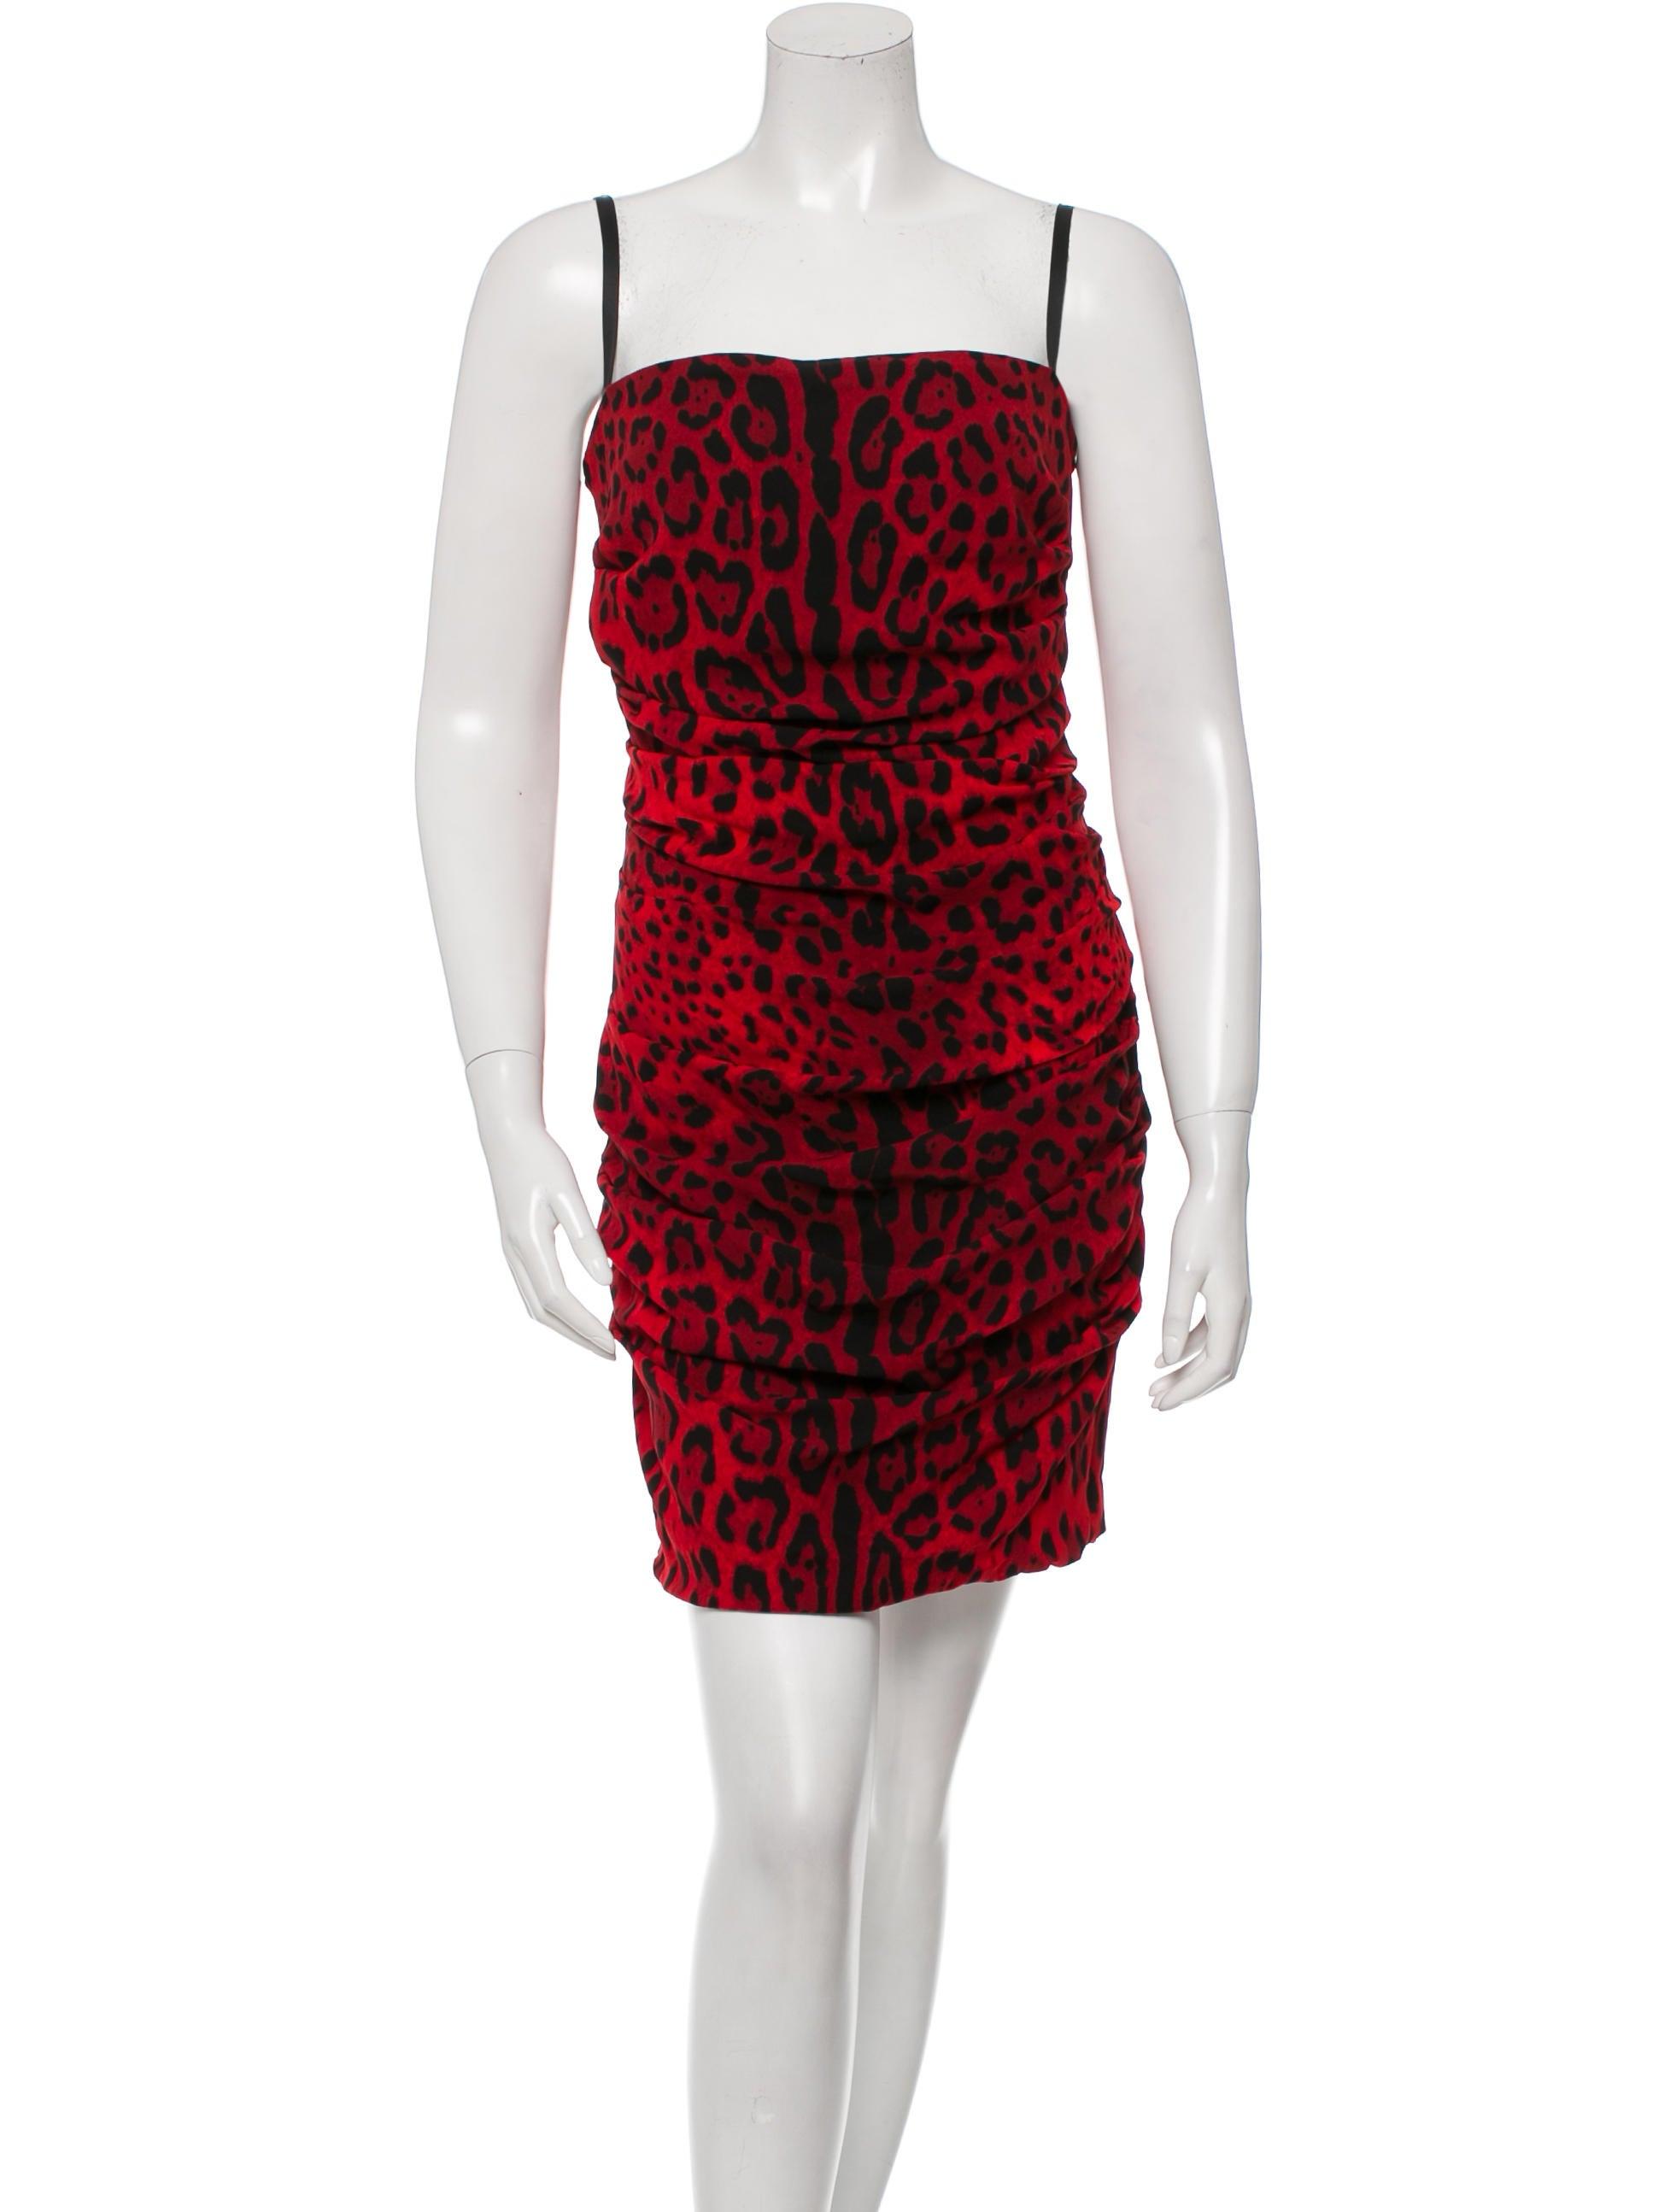 d g ruched cheetah print dress clothing wdg30639 the